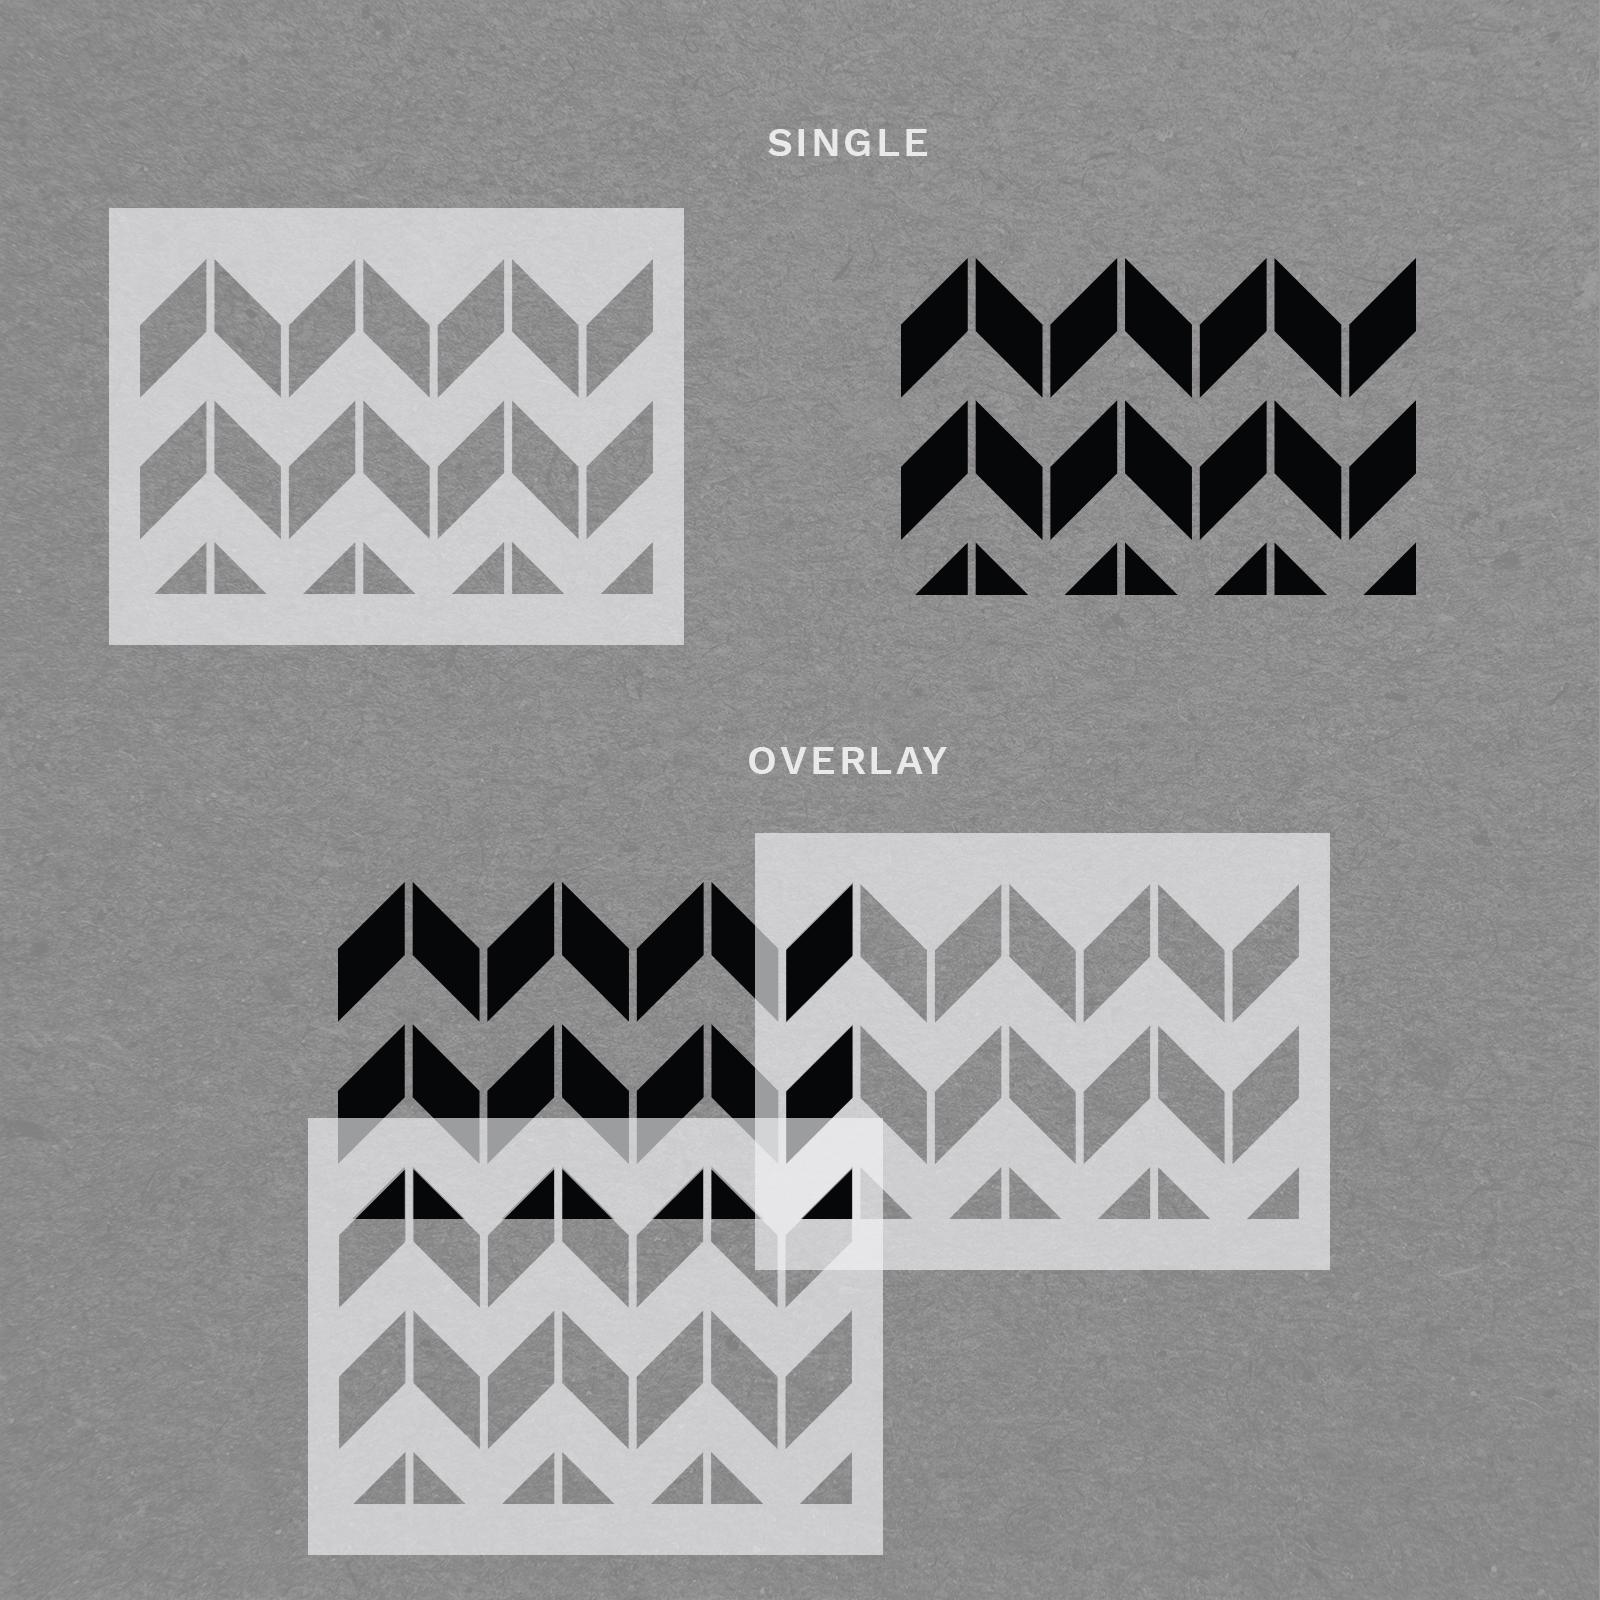 "Chevron Horizontal Stencil - Reusable Chevron Wall Stencil - 33"" x 19.5"" Size"